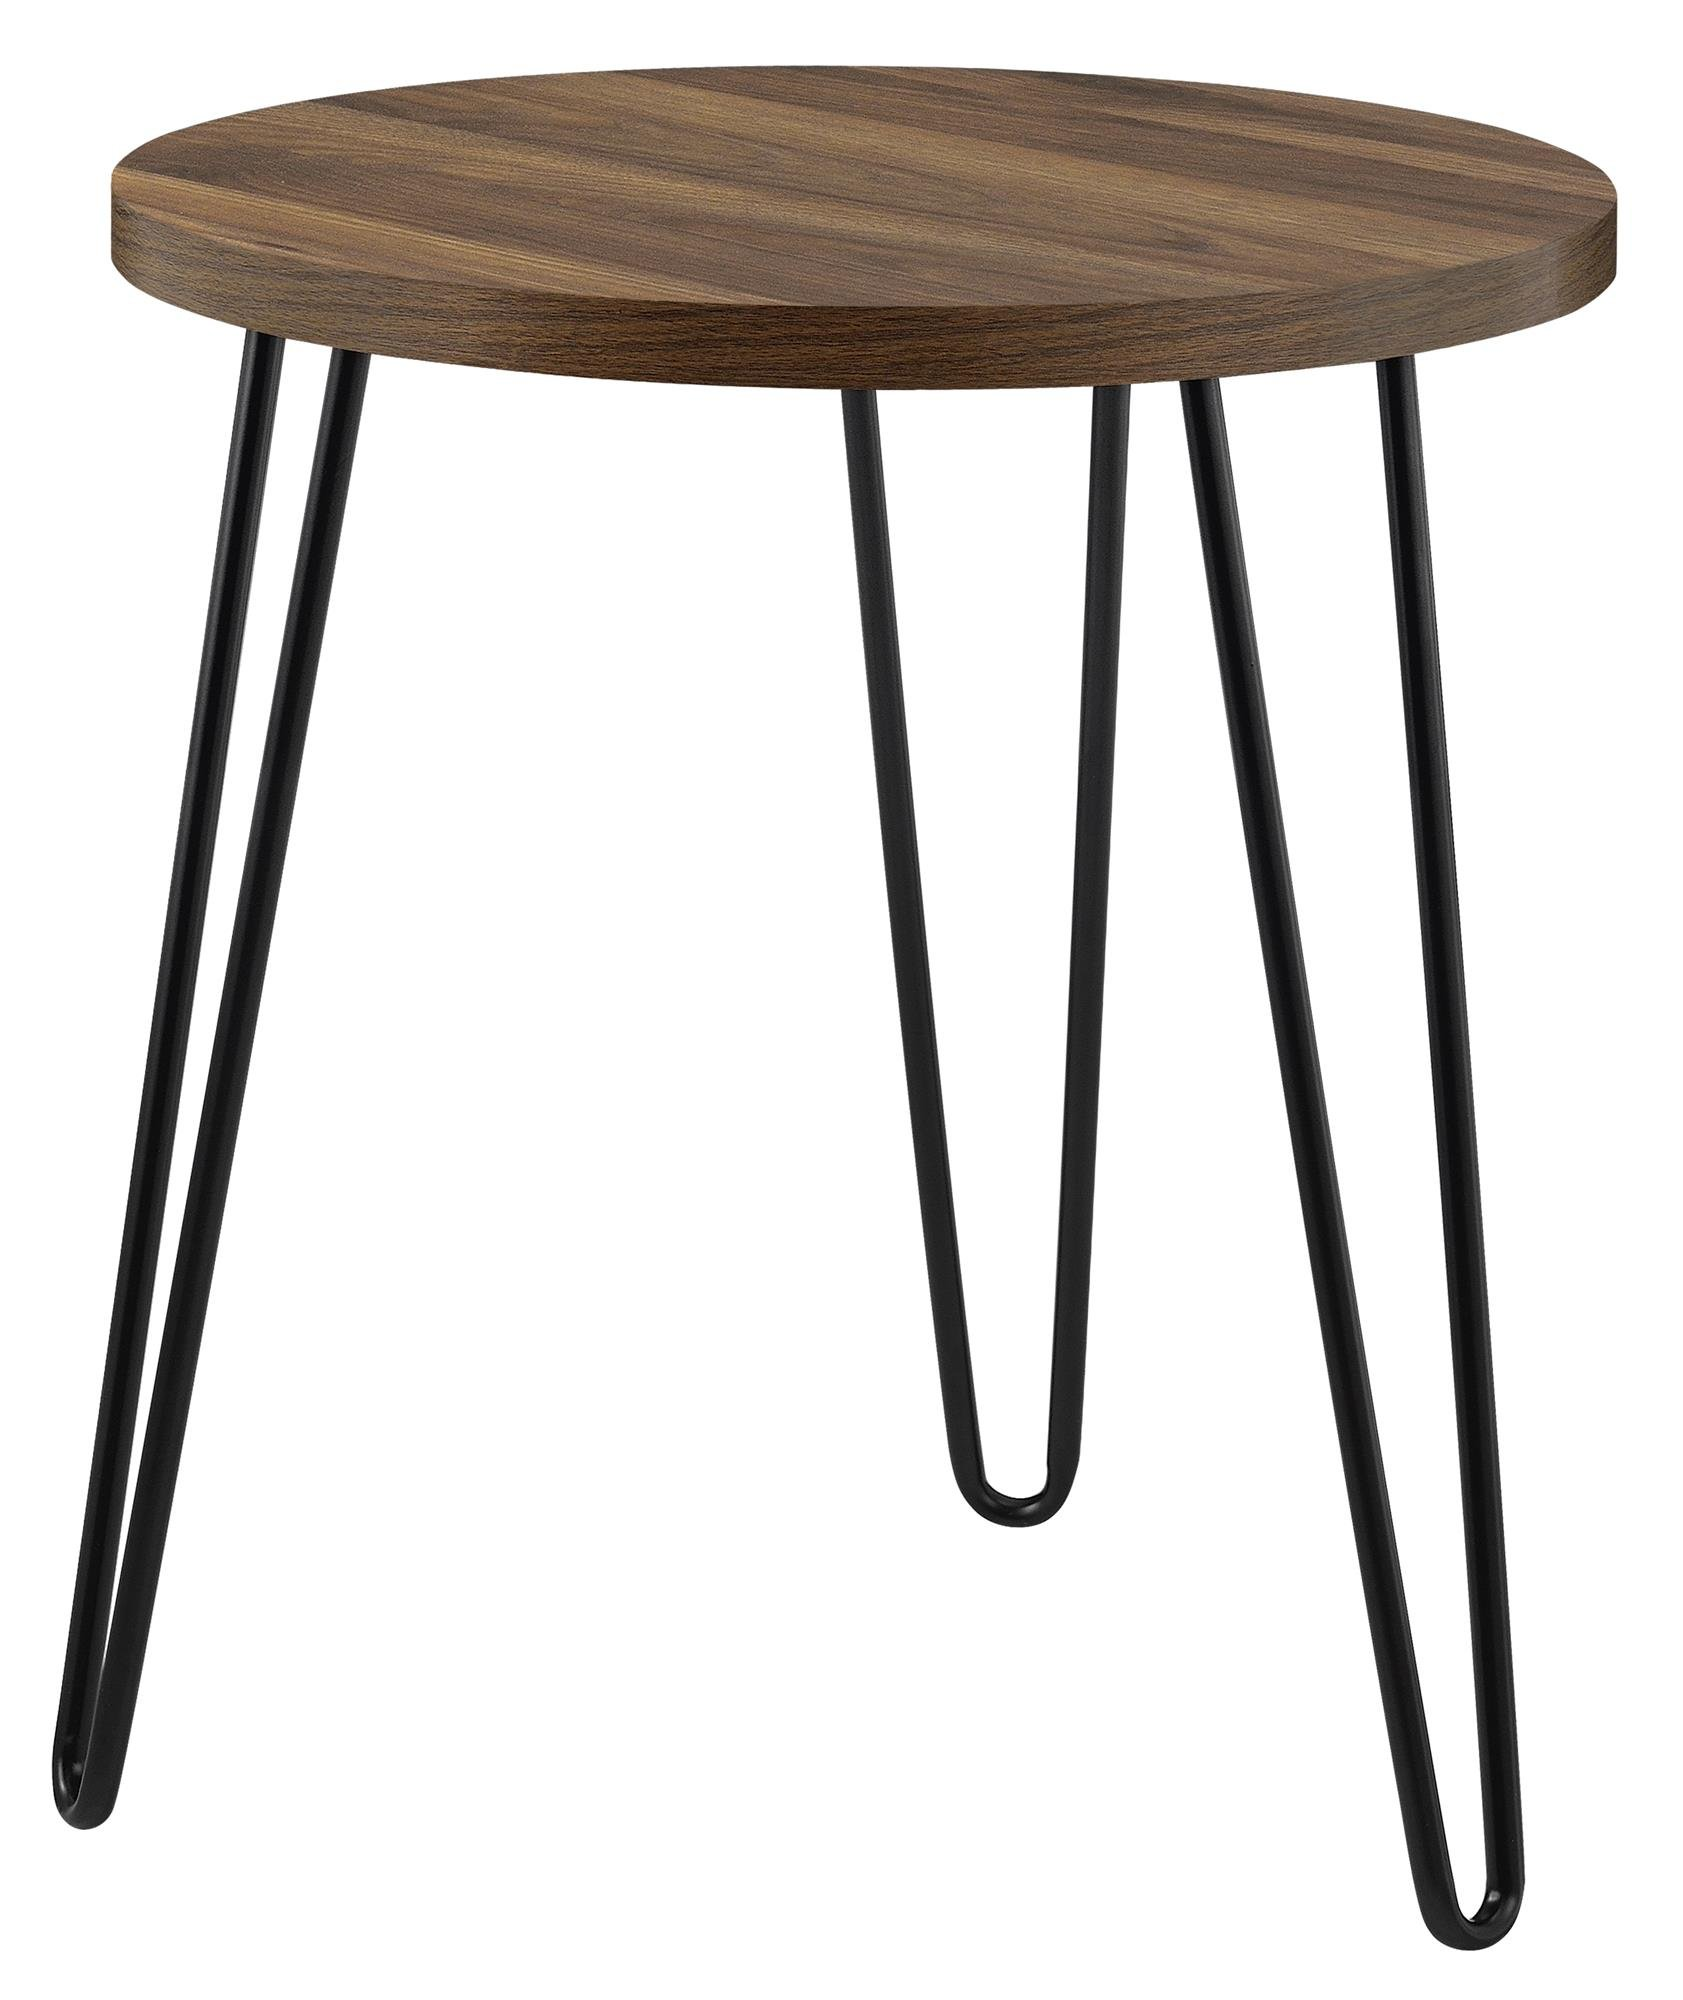 Ameriwood Home 3613222COM Owen Retro End Table, Walnut